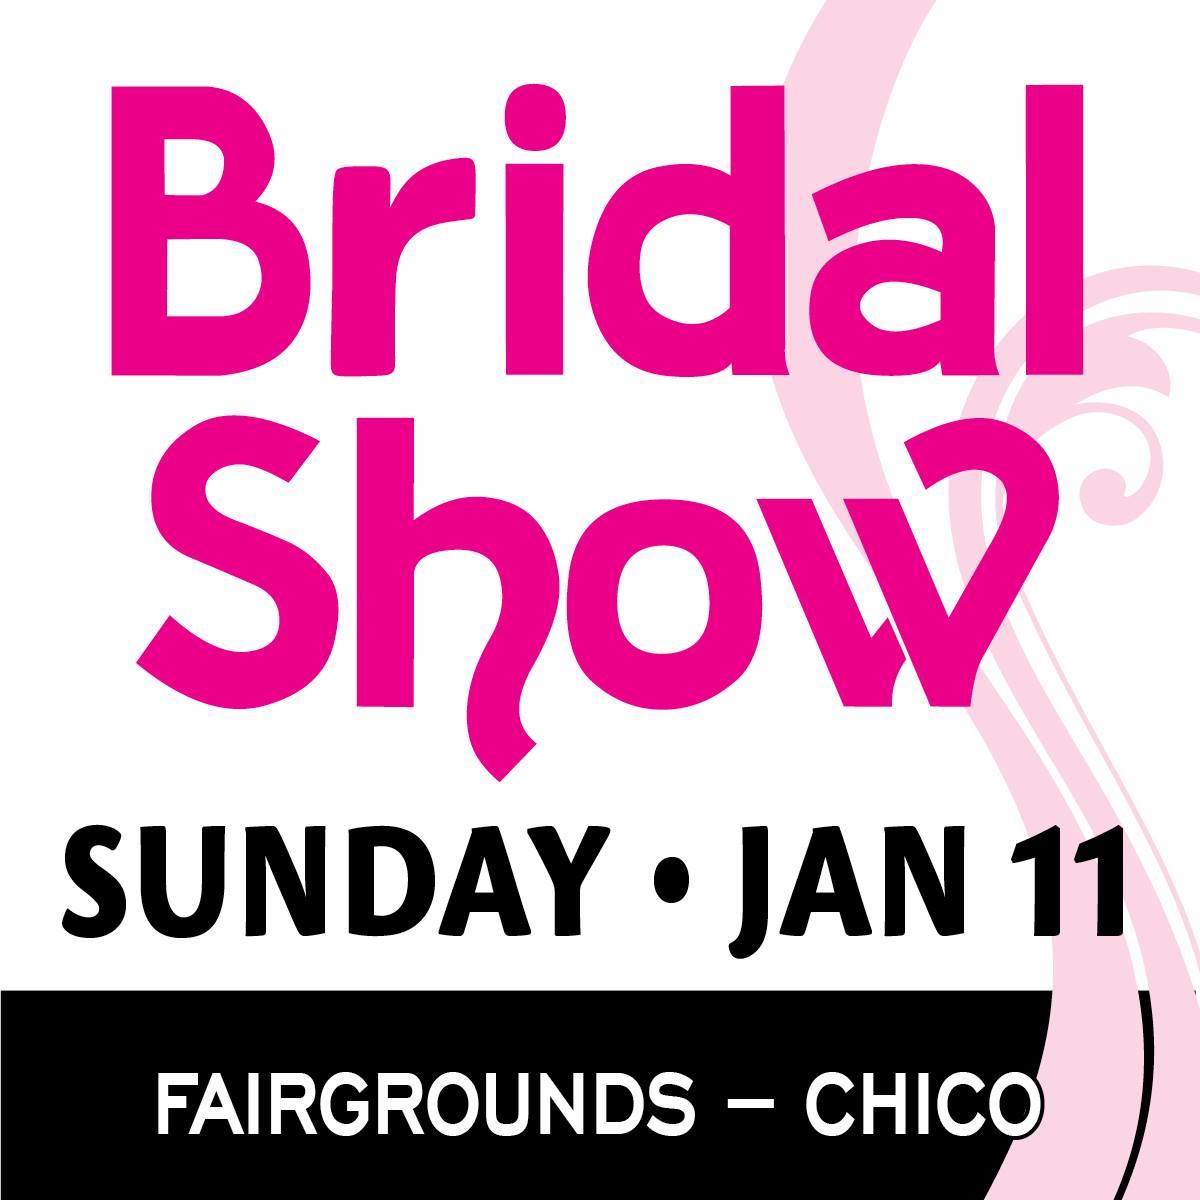 Chico Bridal Show